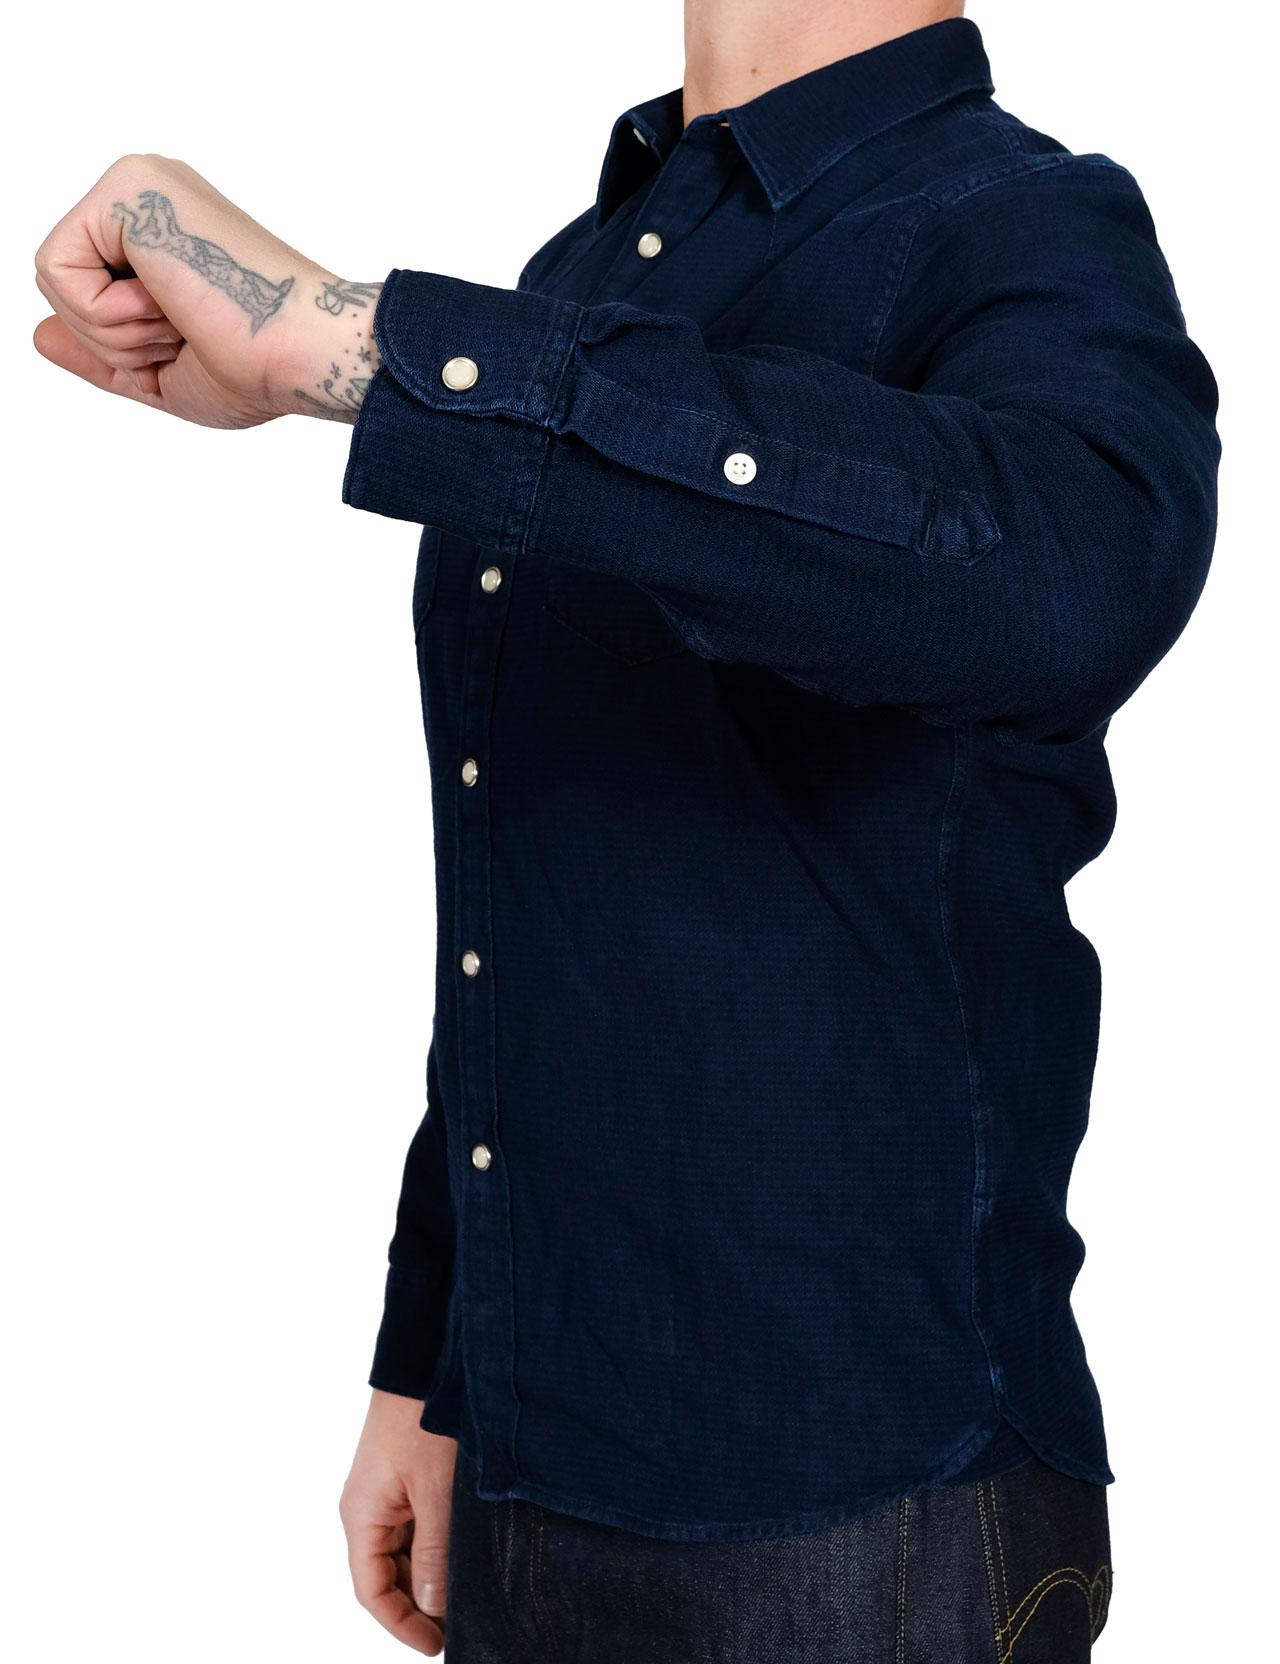 43b2efd2 Lee - 101 Premium Western Shirt - Indigo